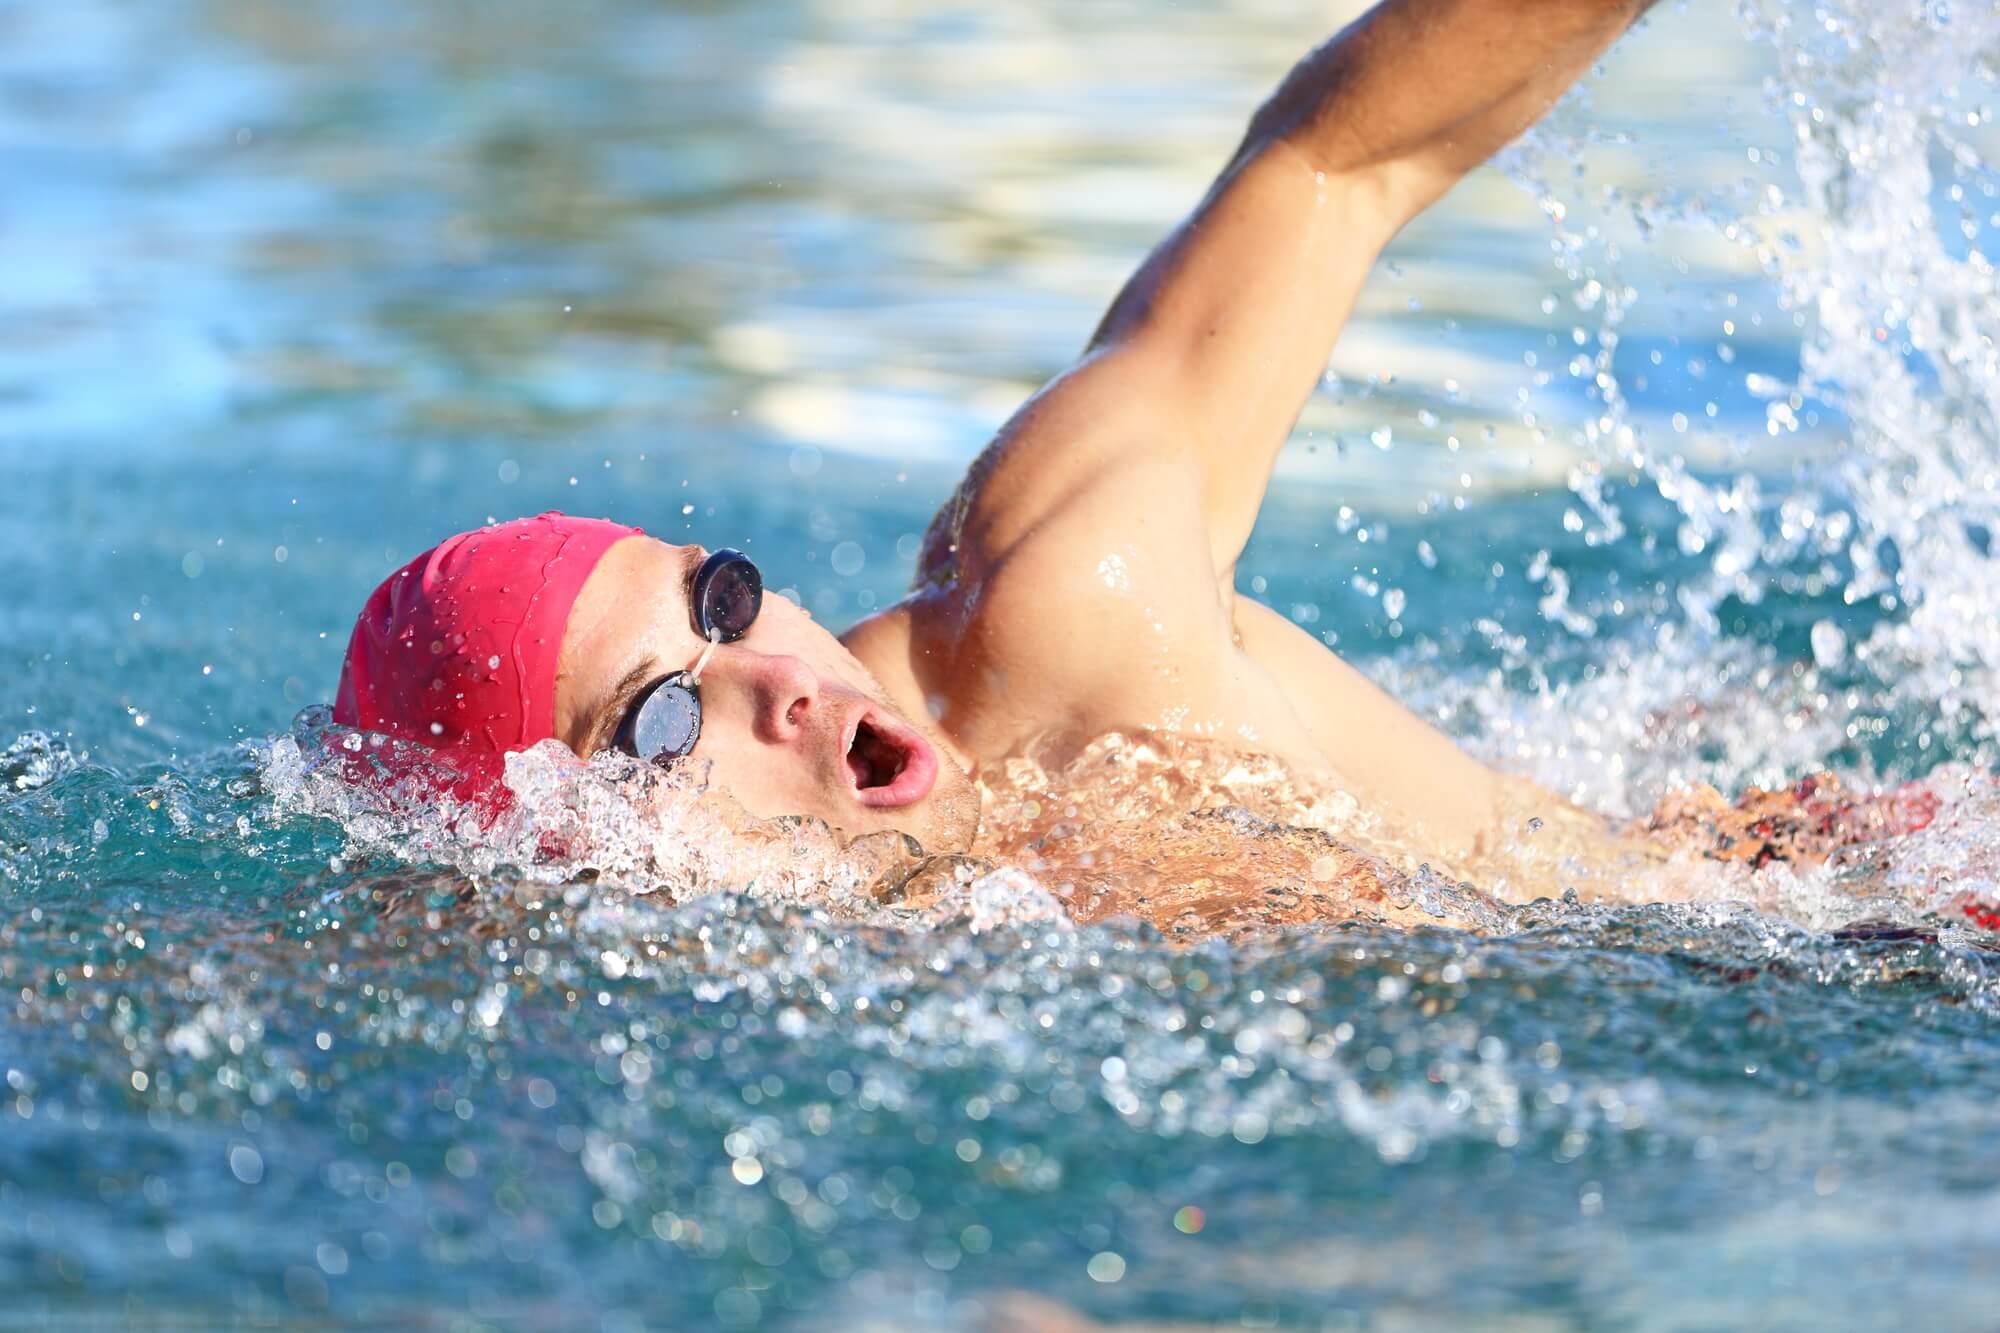 swimmer anti fog spray for swimming goggles